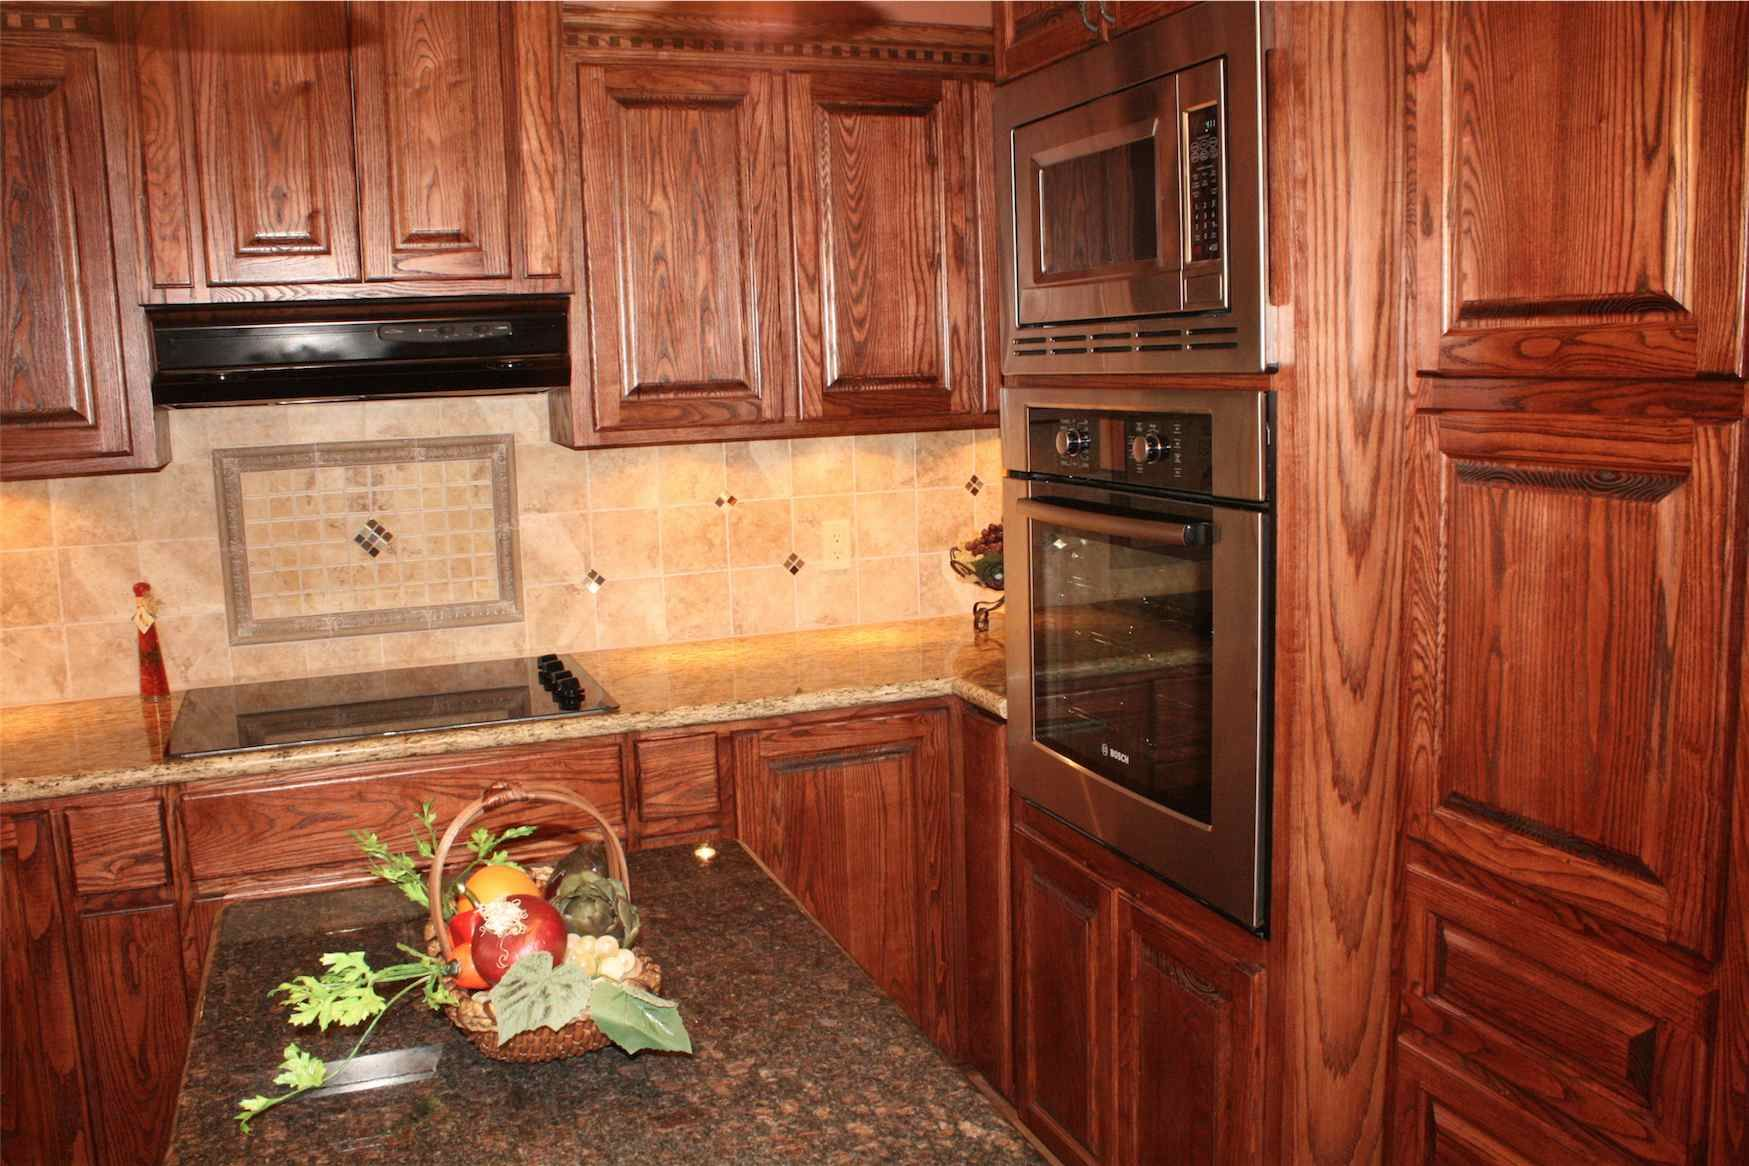 Ash Kitchen Cabinets Sink Basket Strainer Custom With Built In Appliances